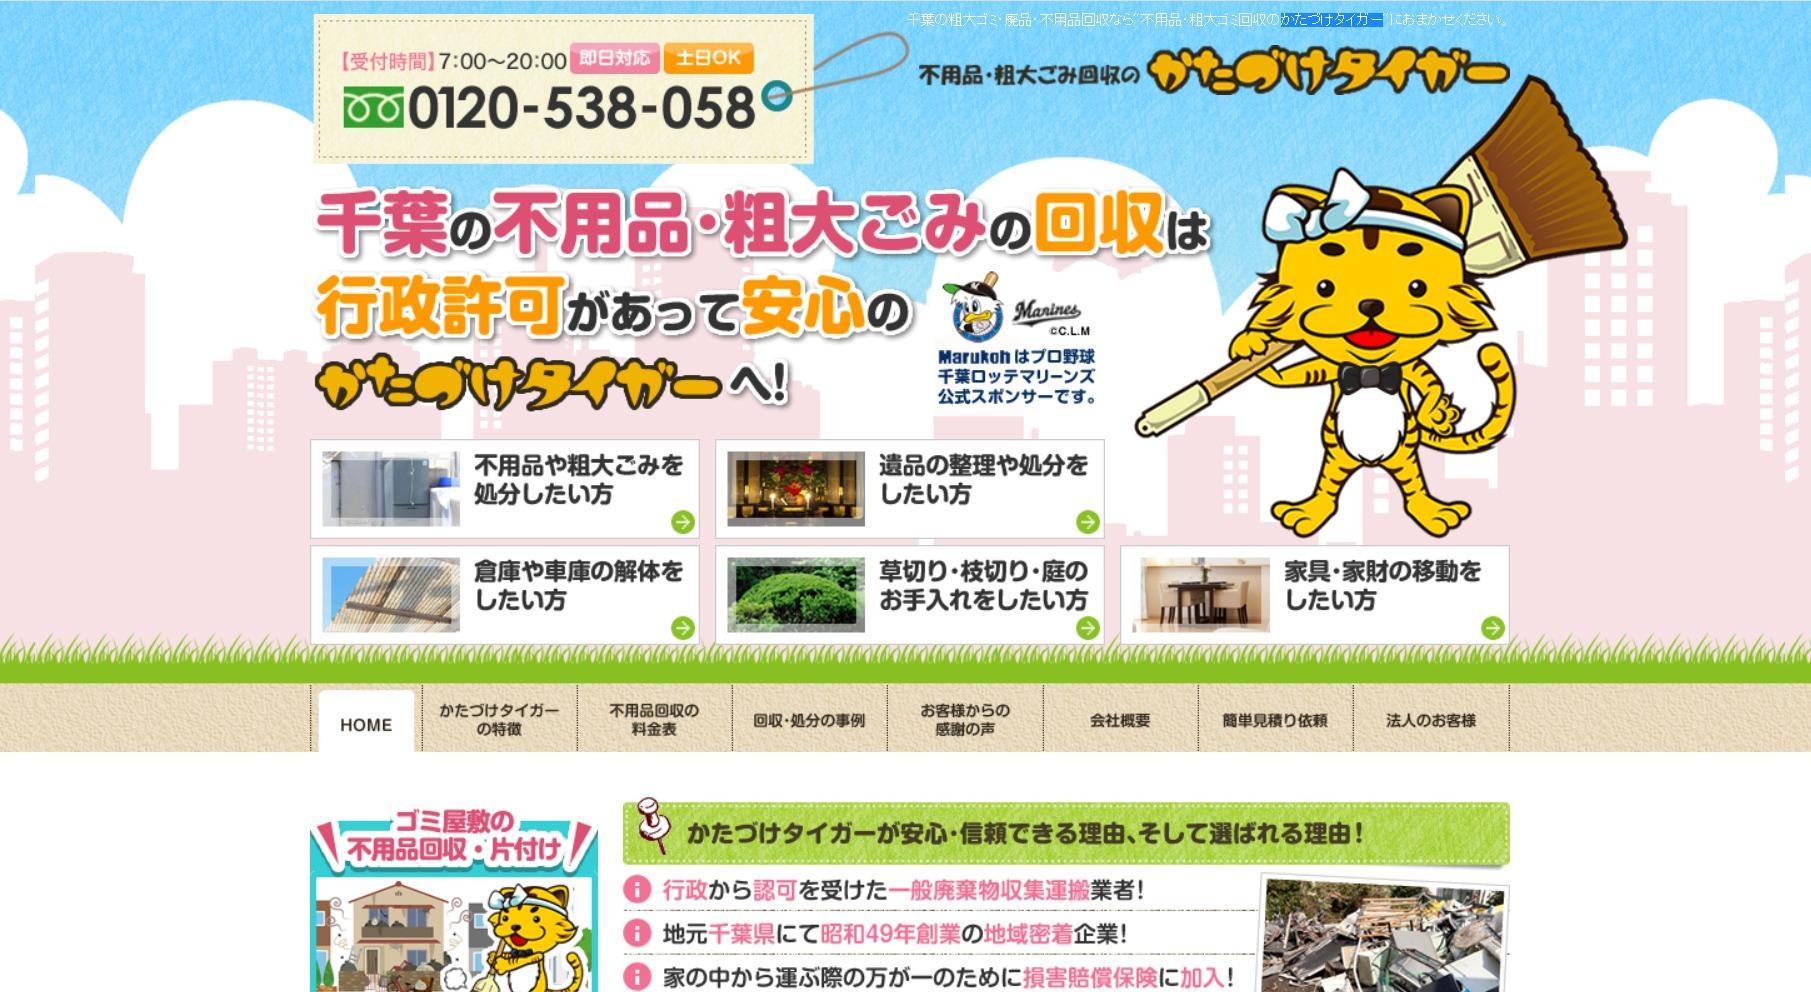 https://katazuke-taiger.com/